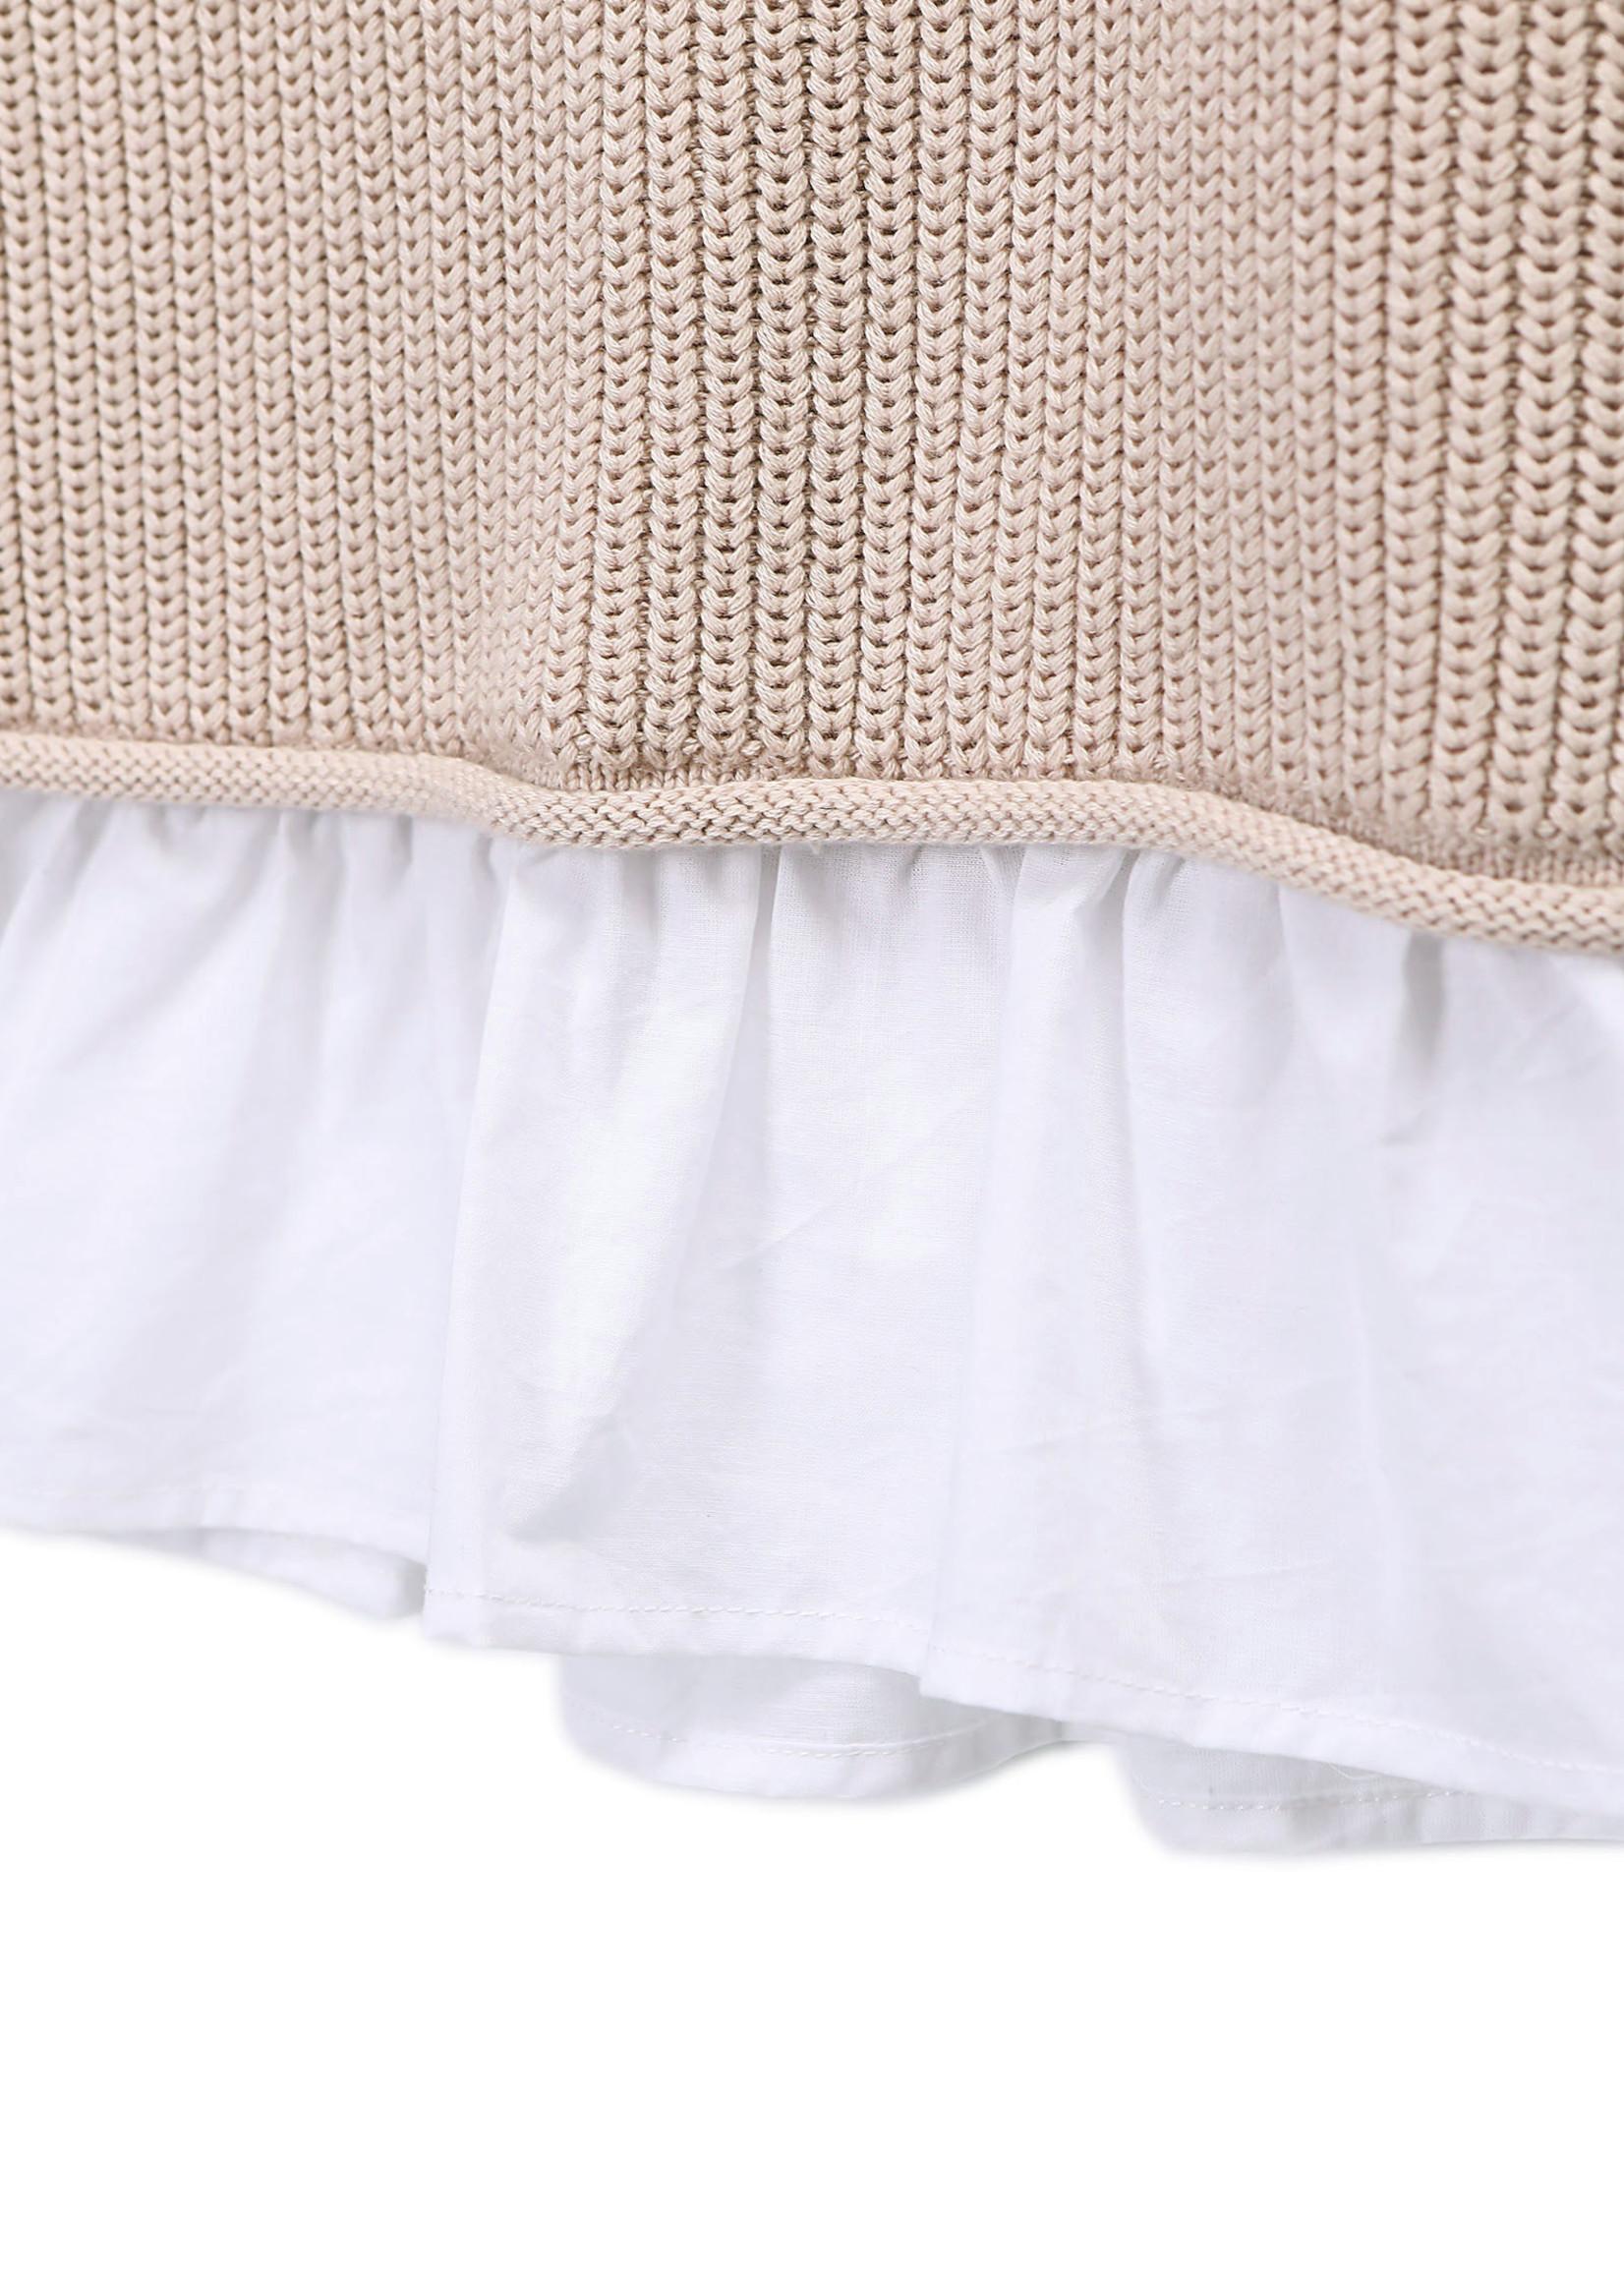 Donsje Amsterdam Flossy Sweater - Soft Sand